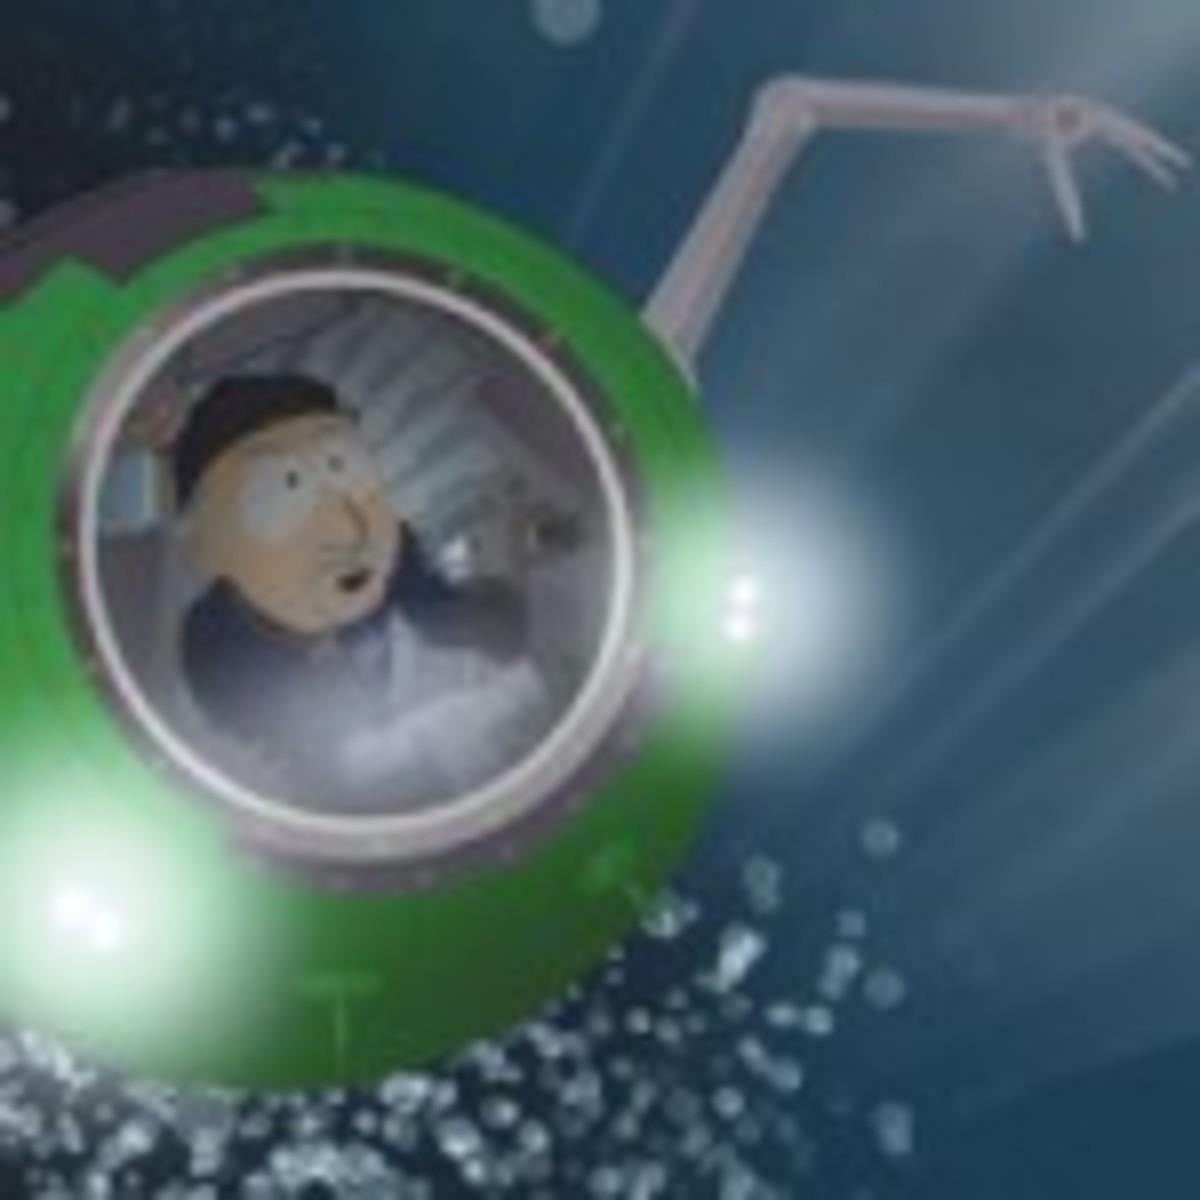 South Park James Cameron single